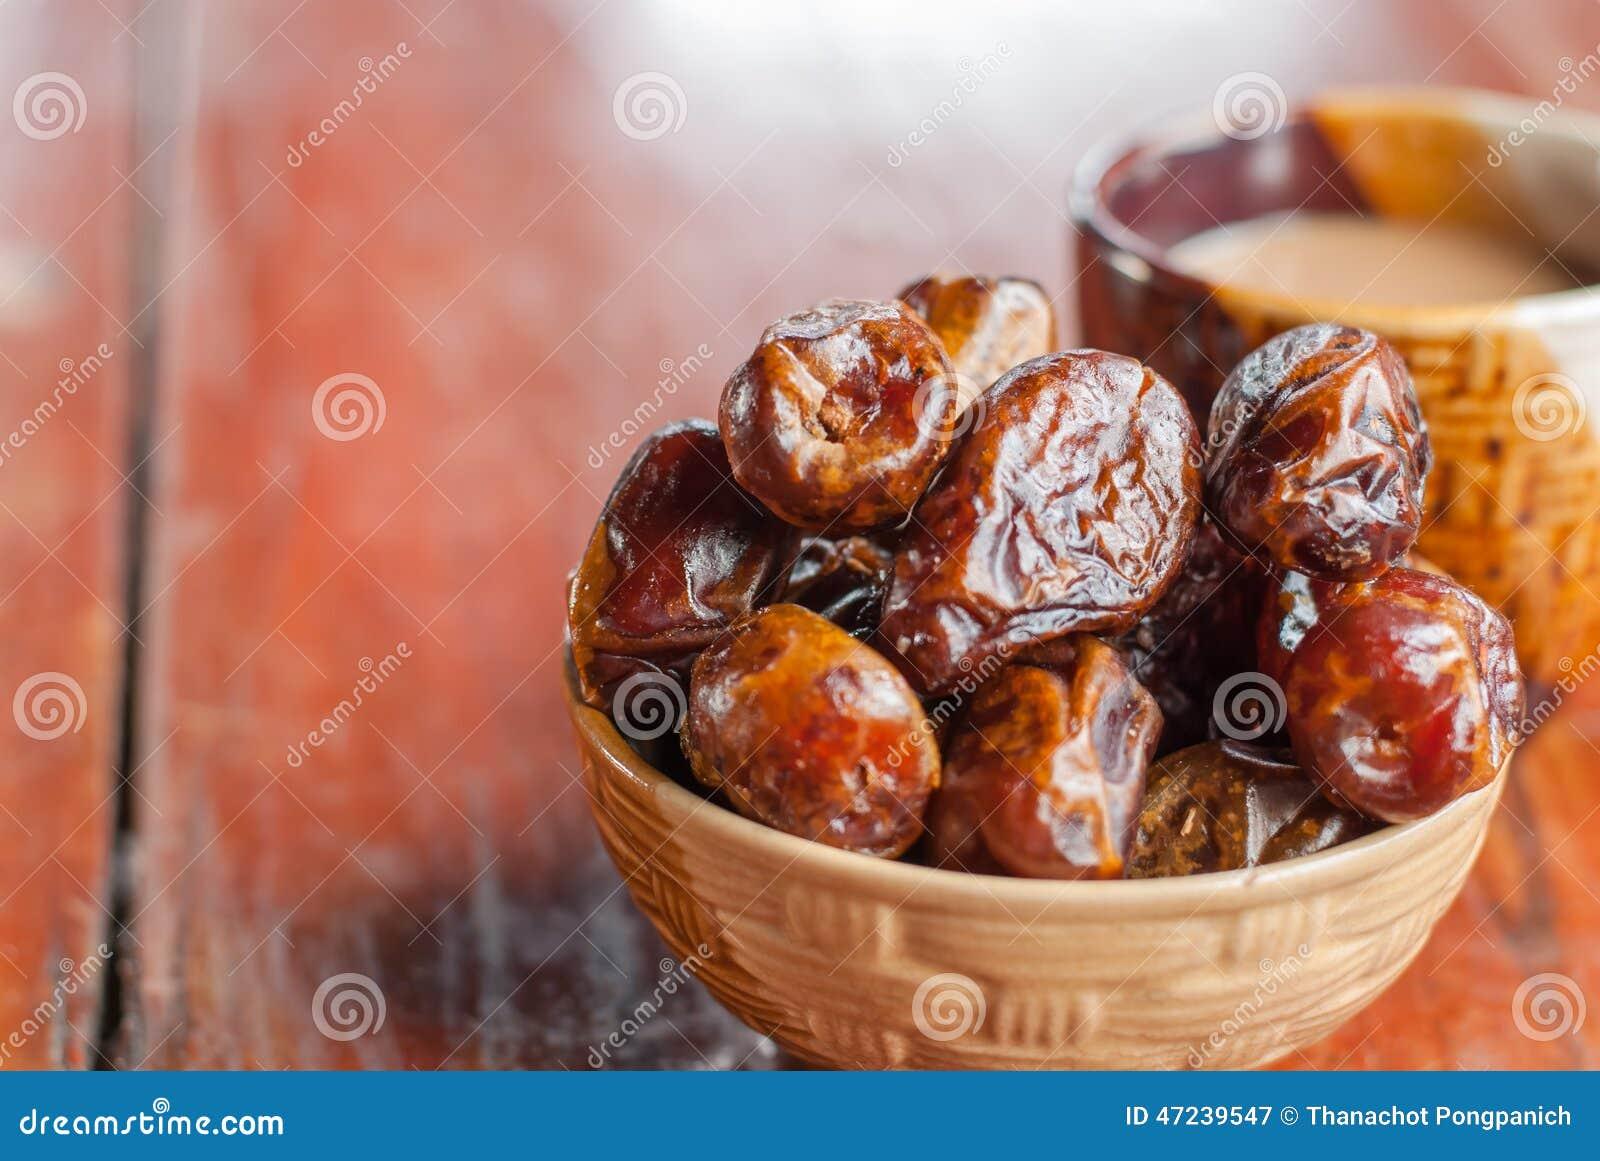 senior dating dates fruit